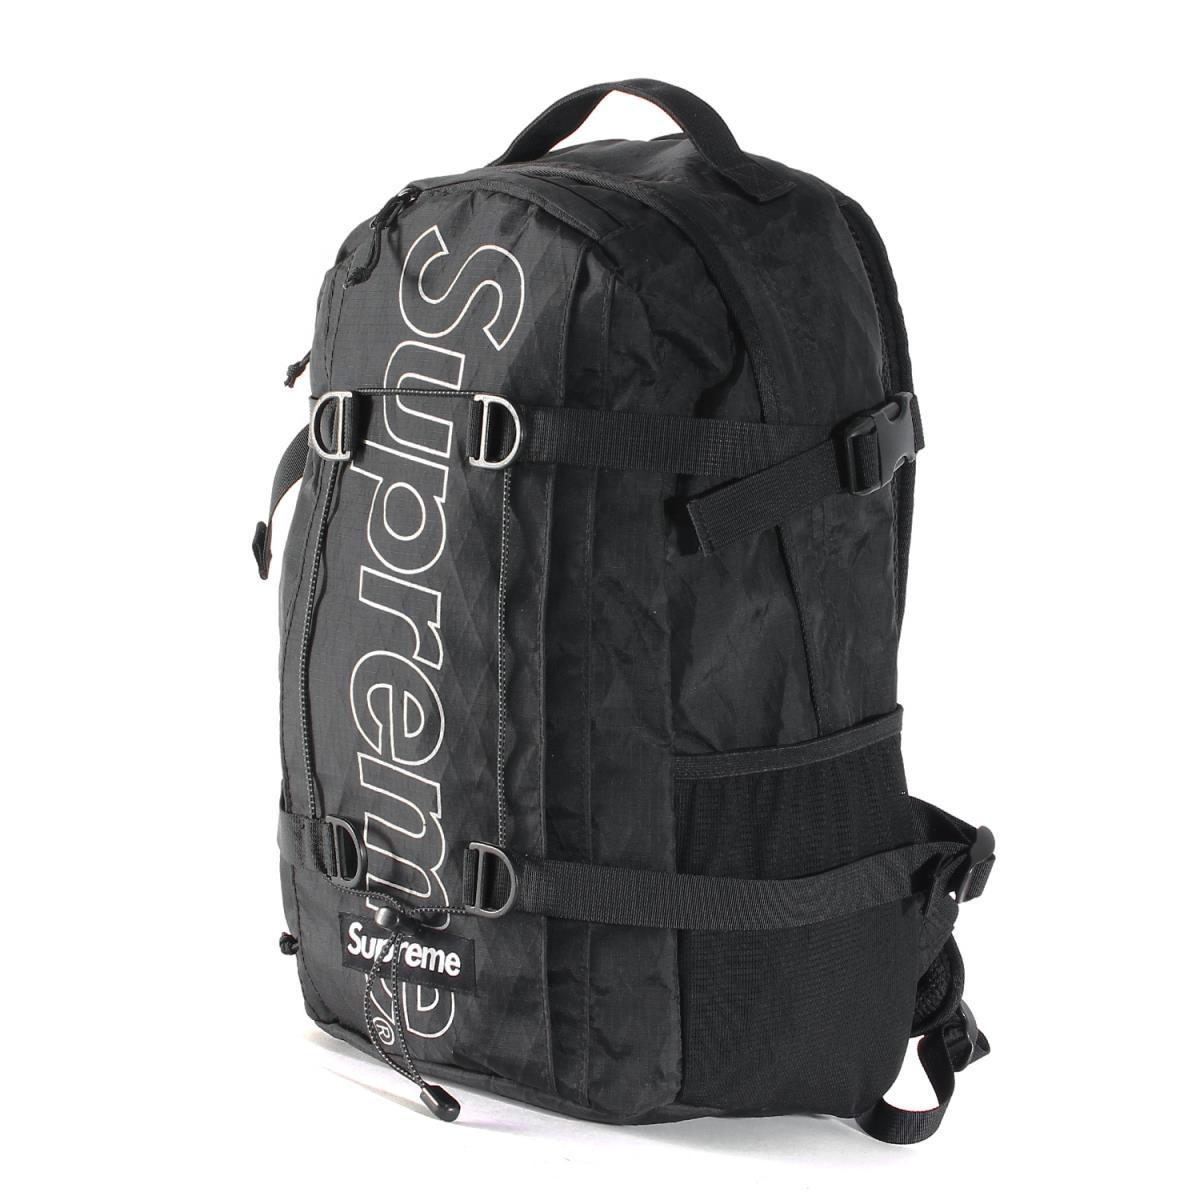 Supreme (シュプリーム) バッグ ブランドロゴ X-PAC バックパック Backpack 18年秋冬 ブラック 【メンズ】【K2234】【中古】【あす楽☆対応可】